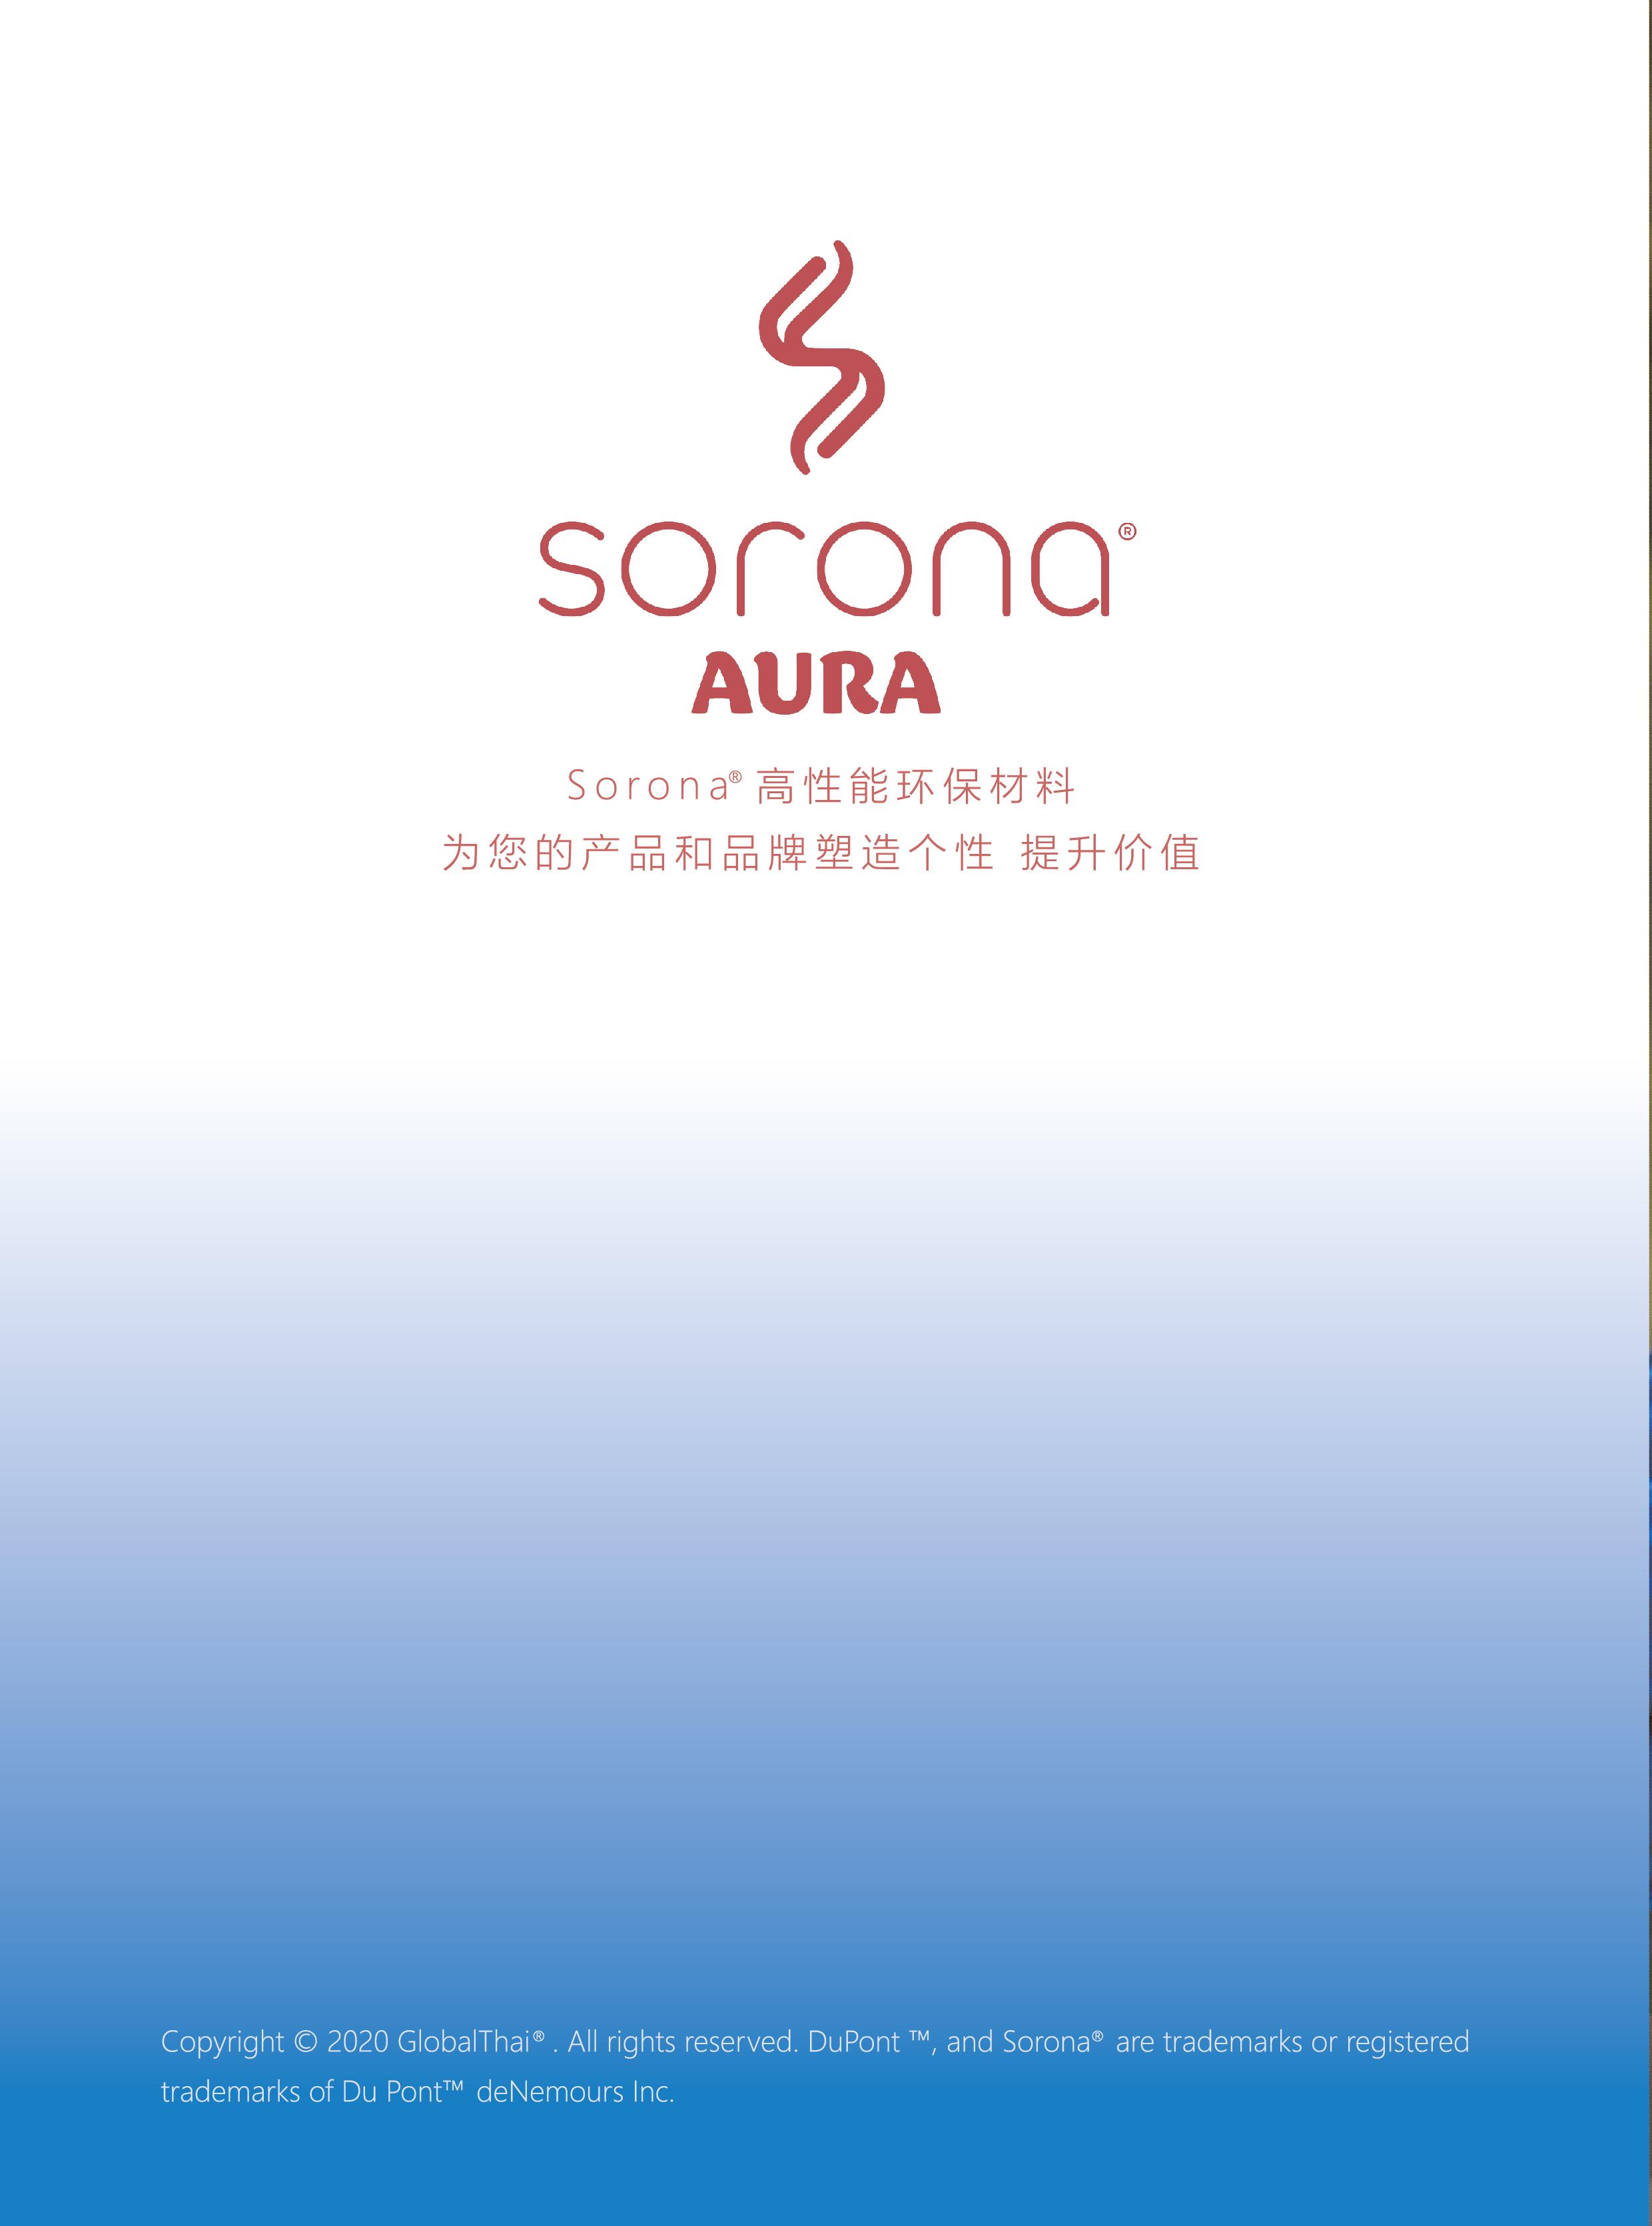 Sorona-1_01.jpg